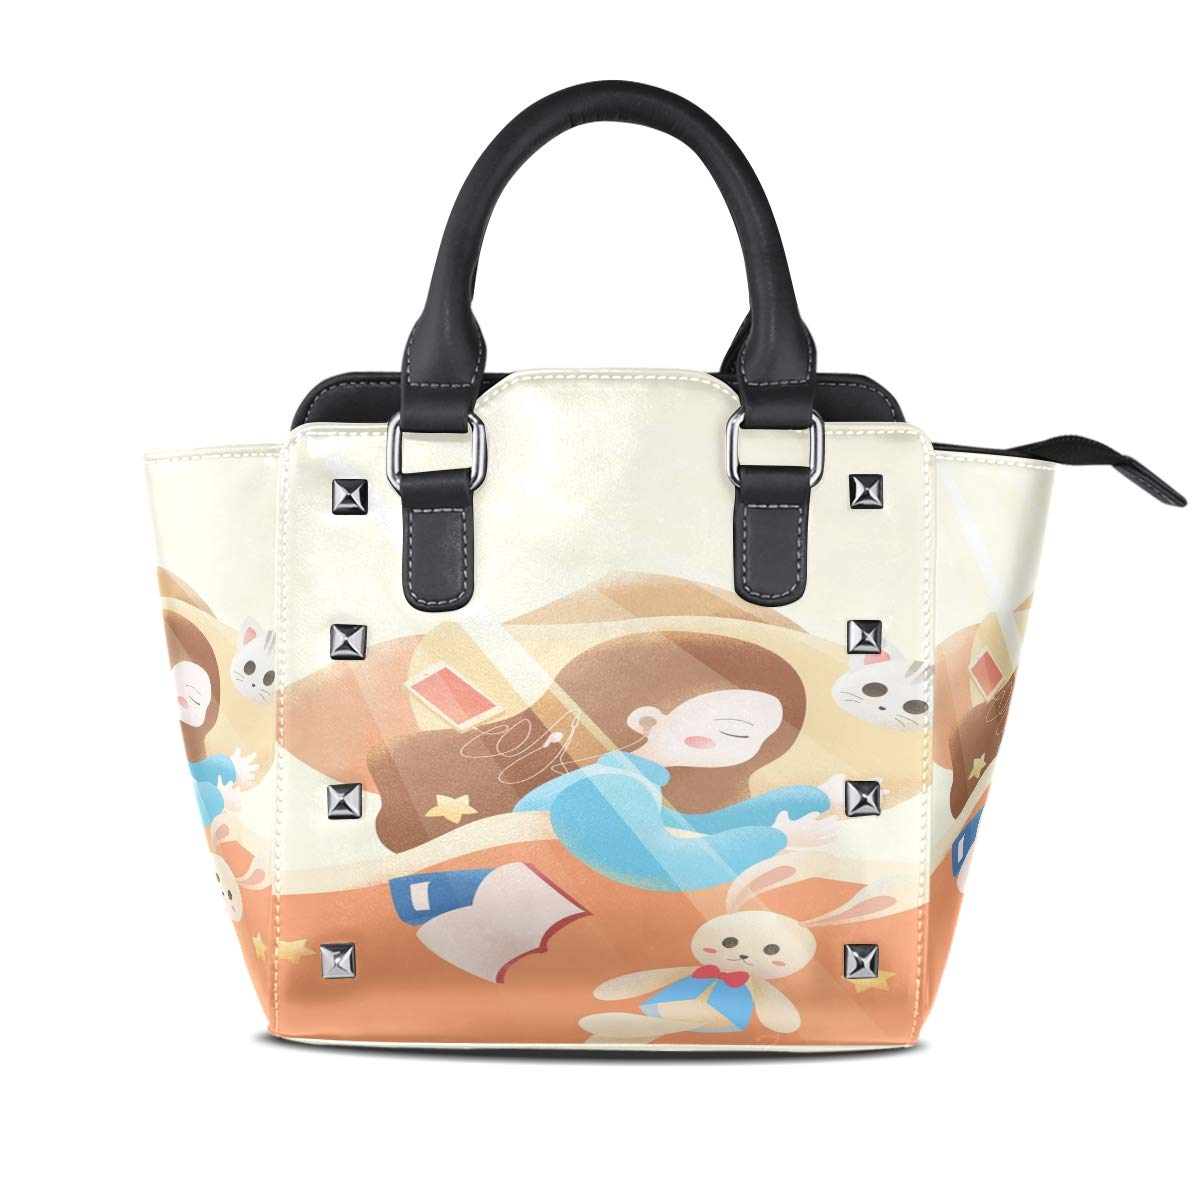 Design5 Handbag Flamingo Shell Sun Genuine Leather Tote Rivet Bag Shoulder Strap Top Handle Women